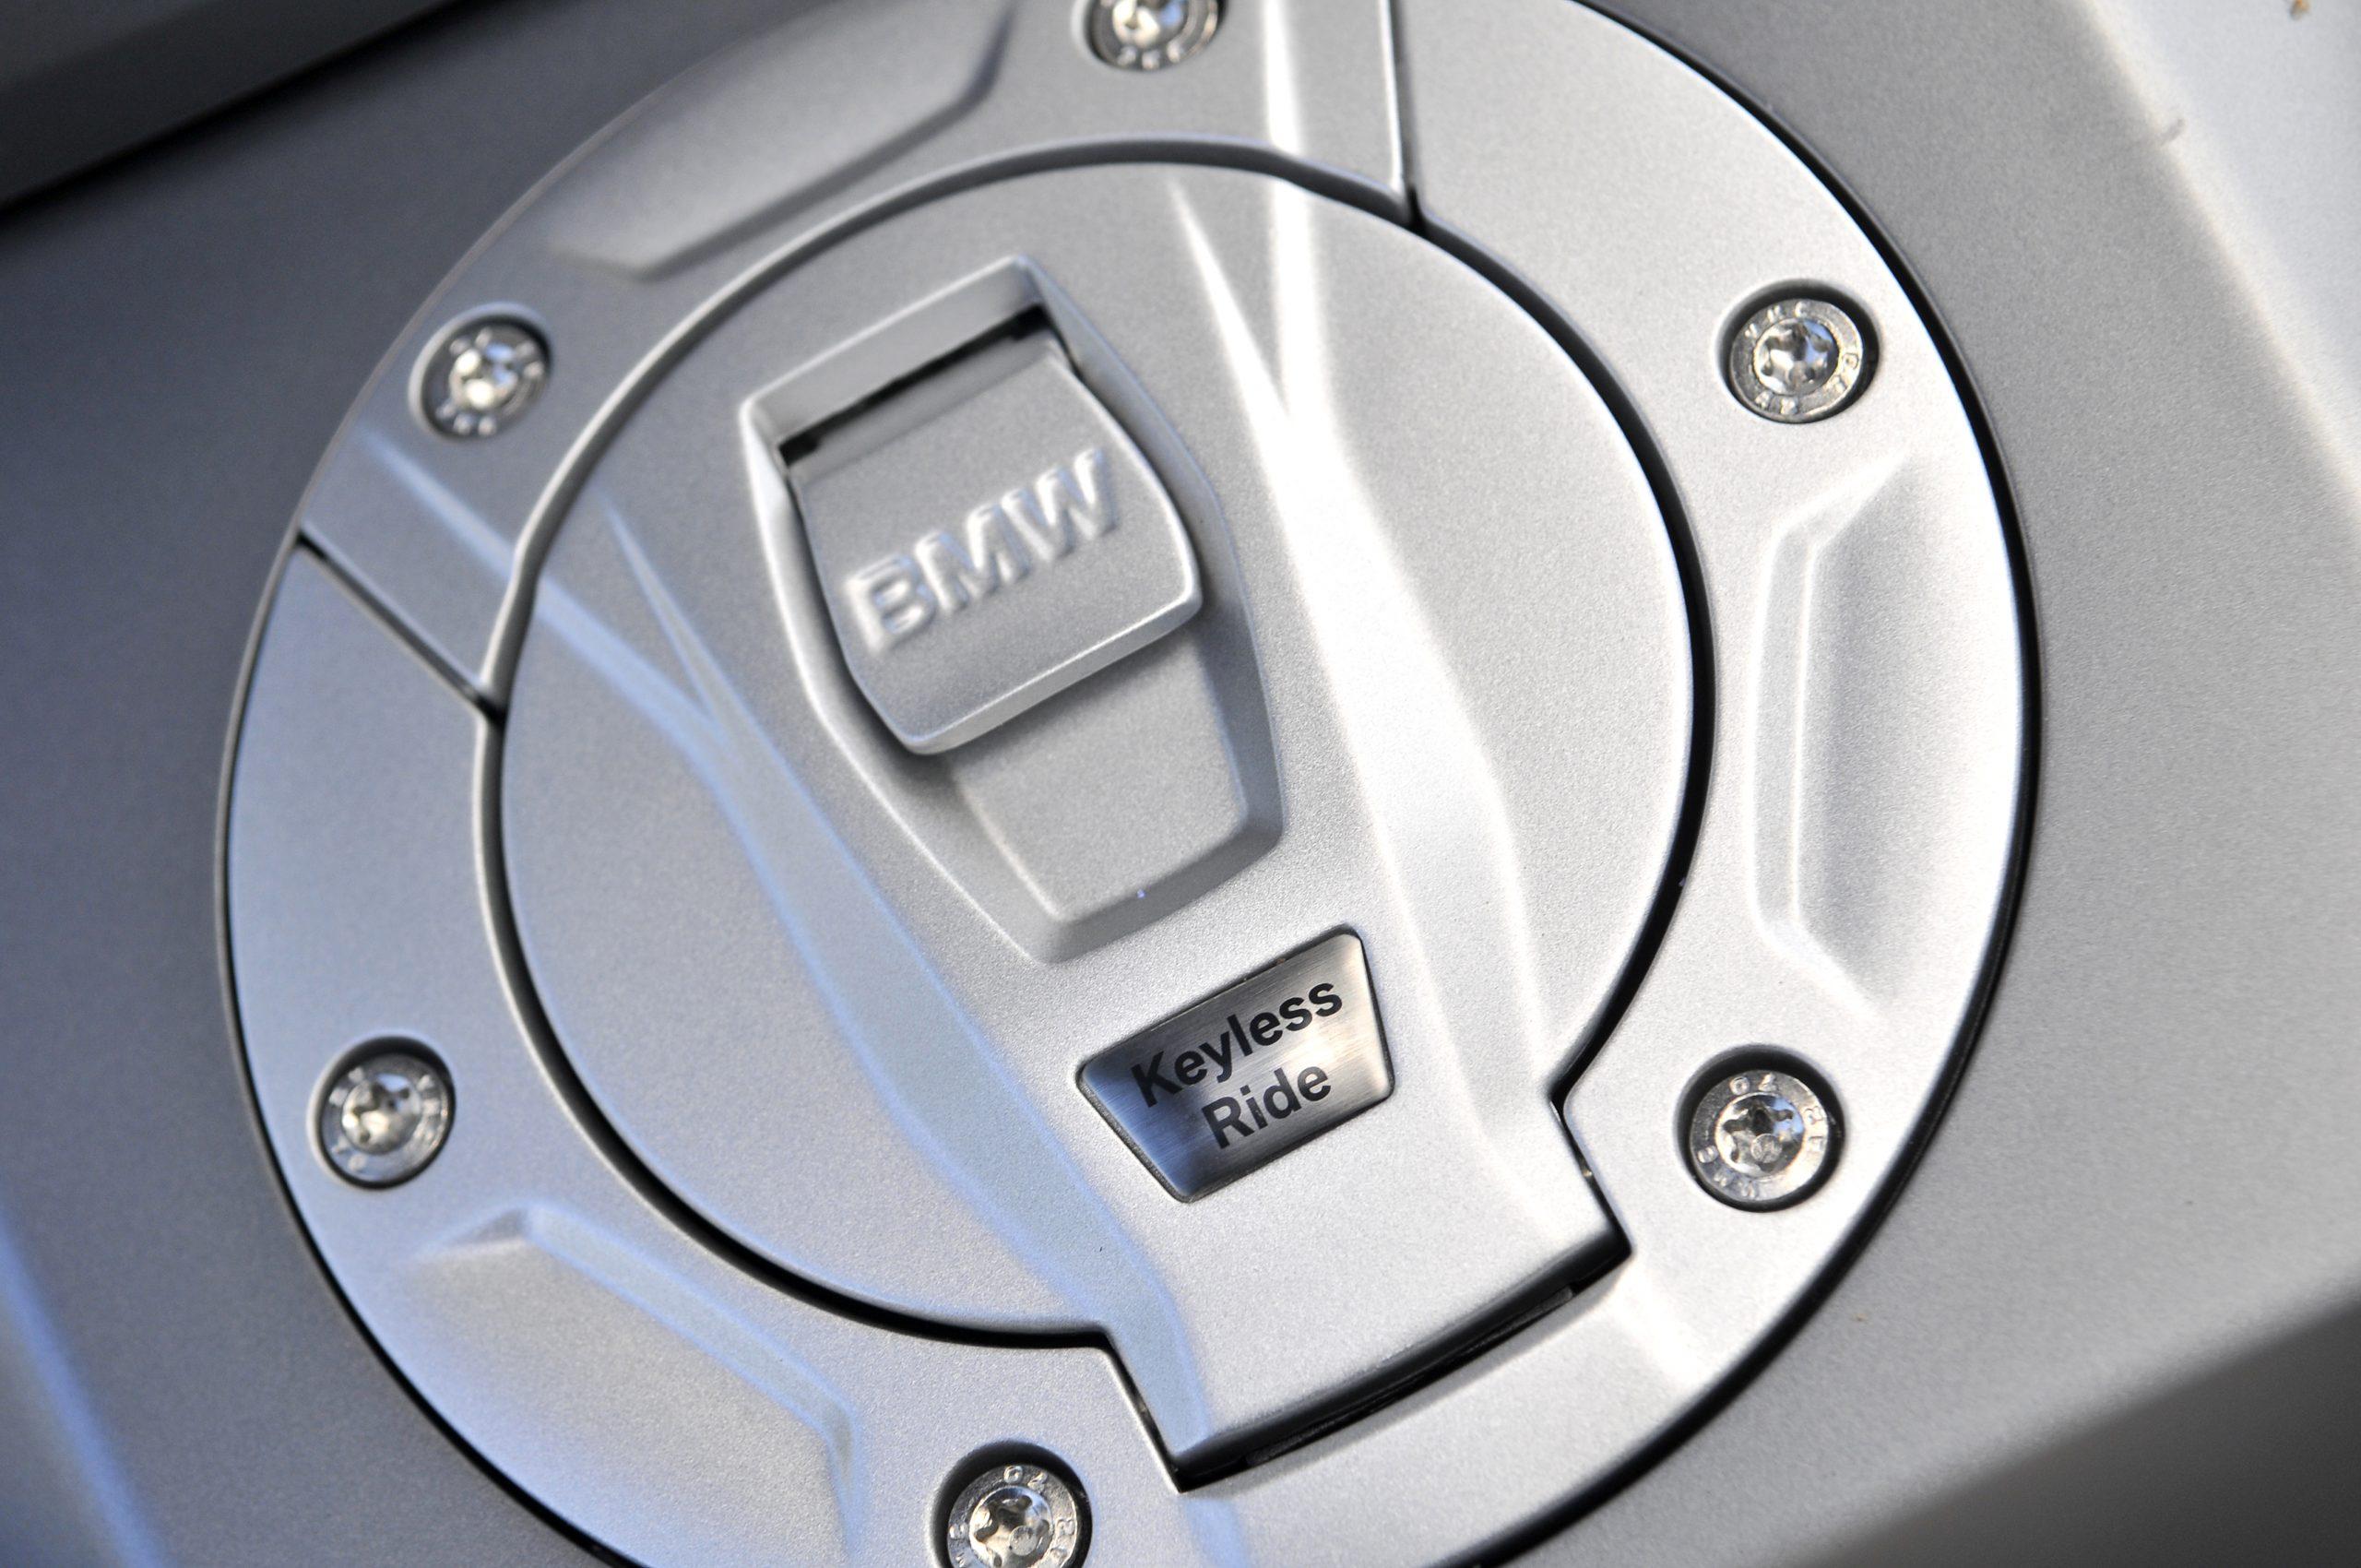 Keyless ride BMW C400 GT